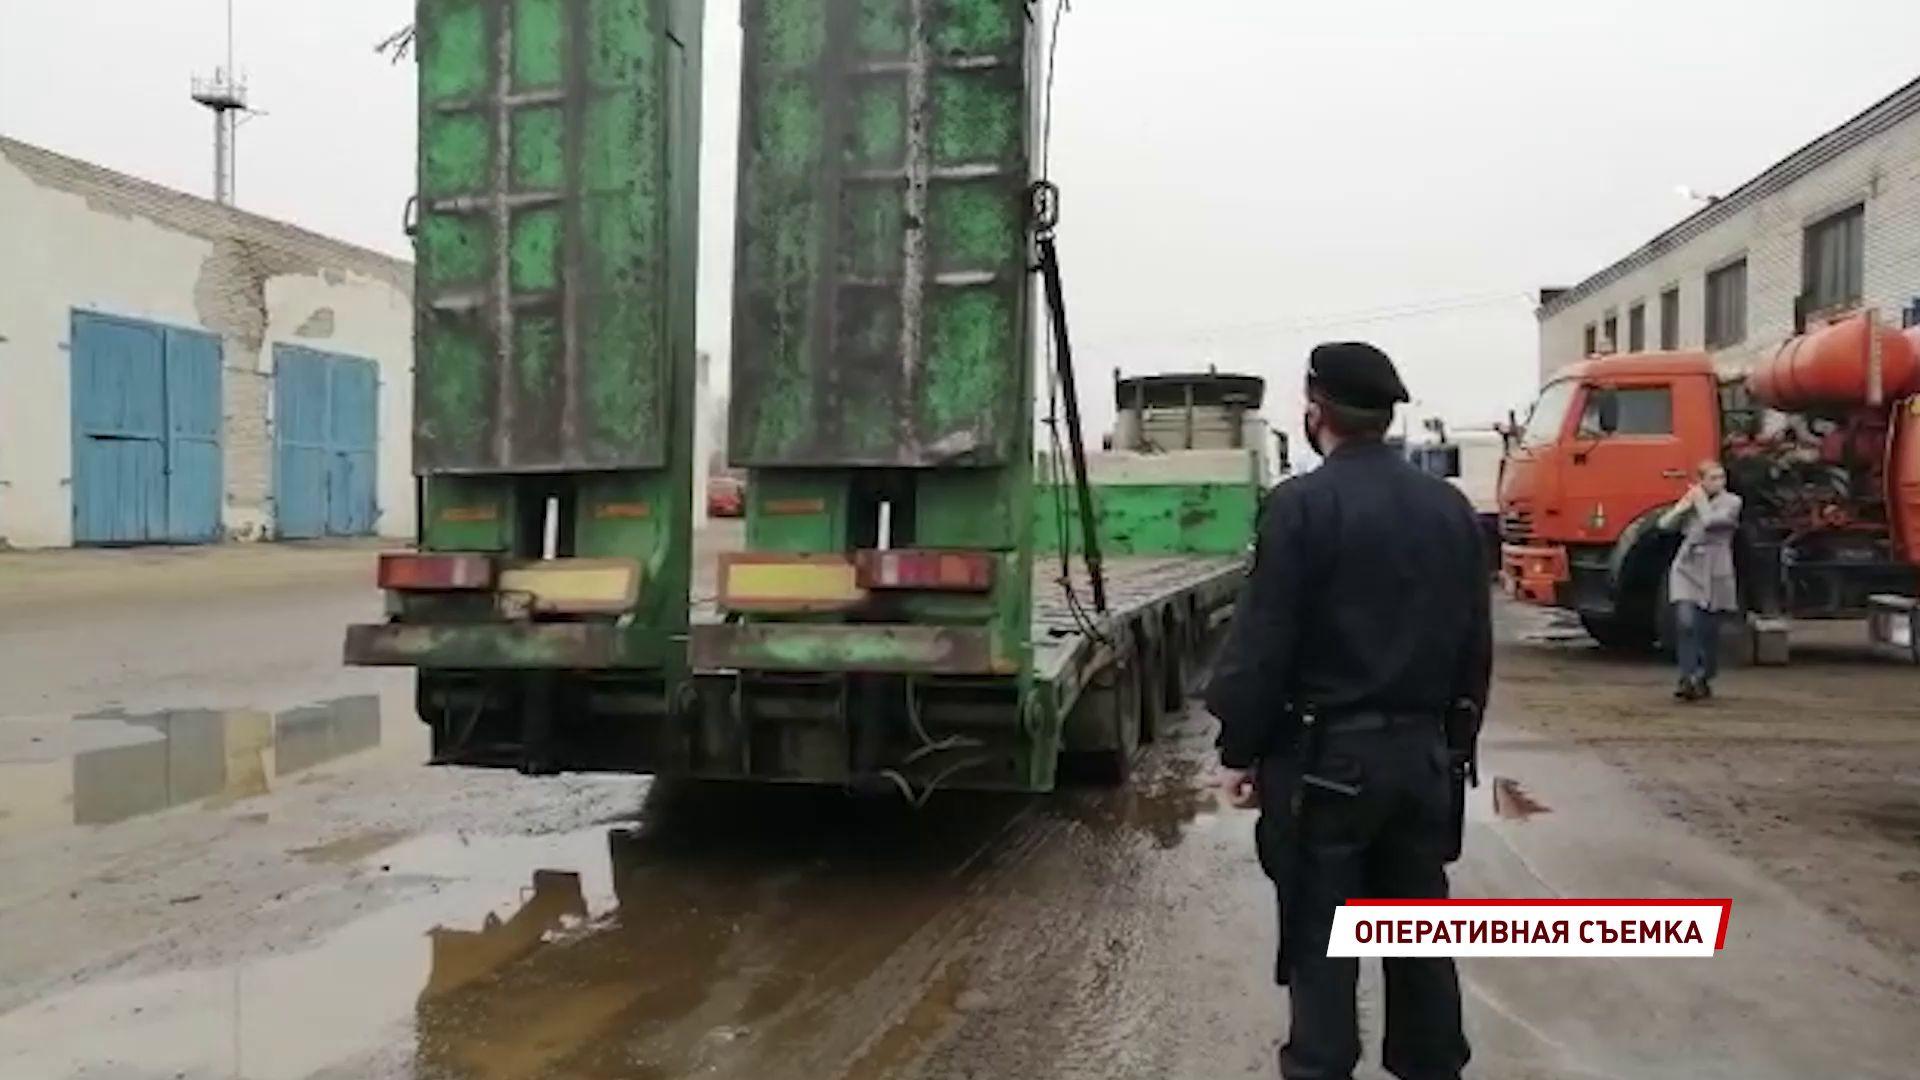 В Ярославле приставы арестовали два грузовика